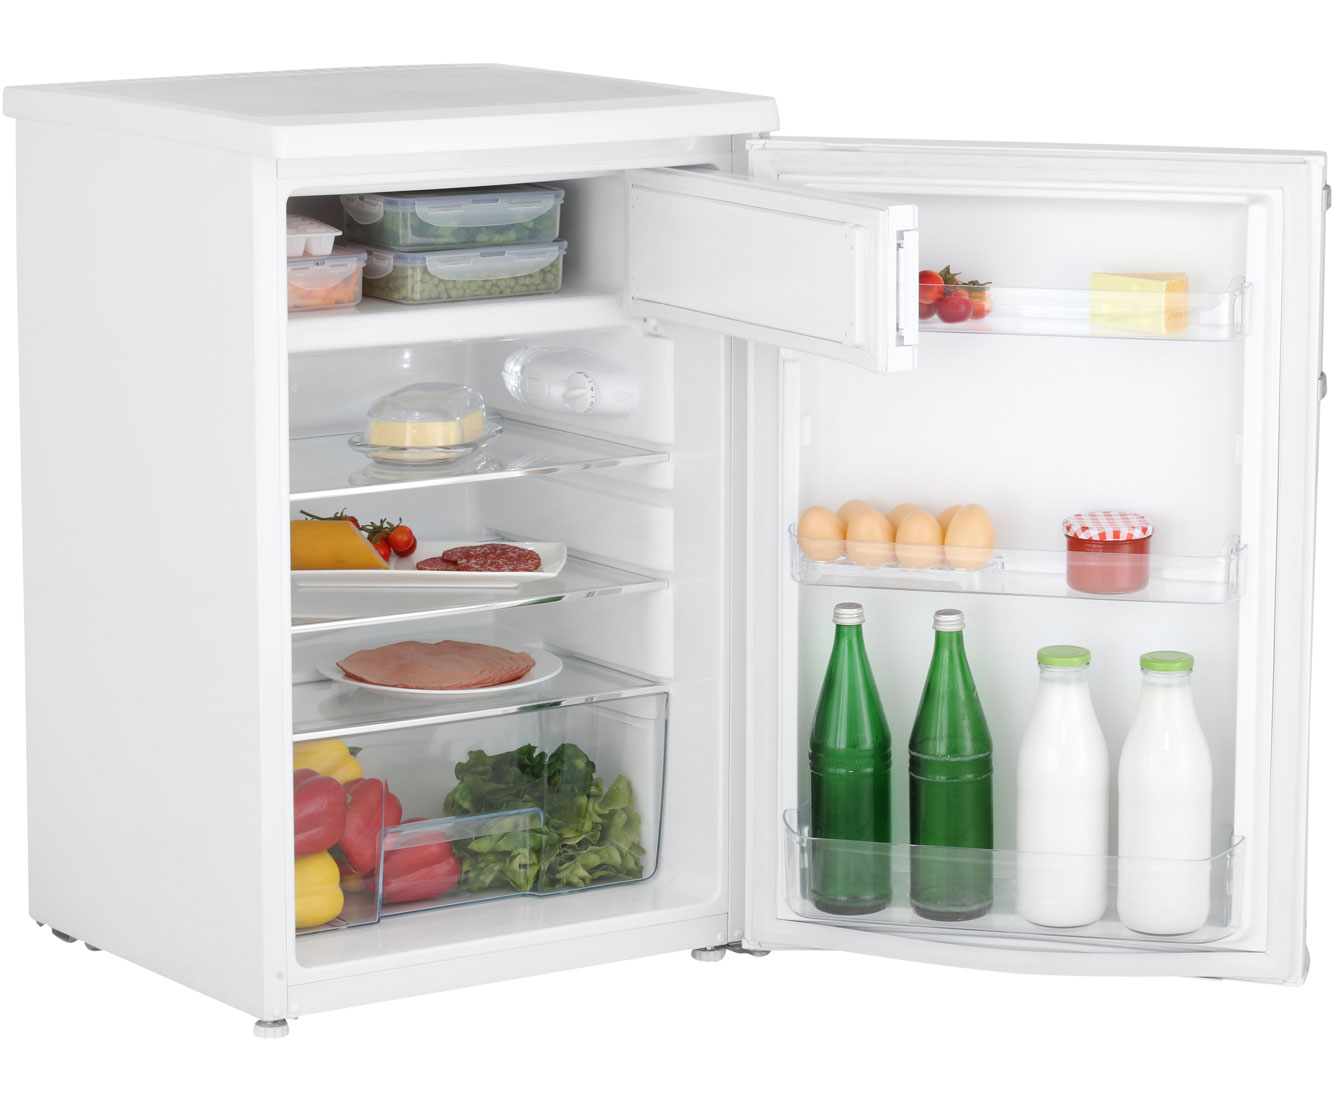 Amica Kühlschrank Kühlt Nicht Mehr : Amica kühlschrank kühlt nicht mehr kühlschrank kühlt nicht